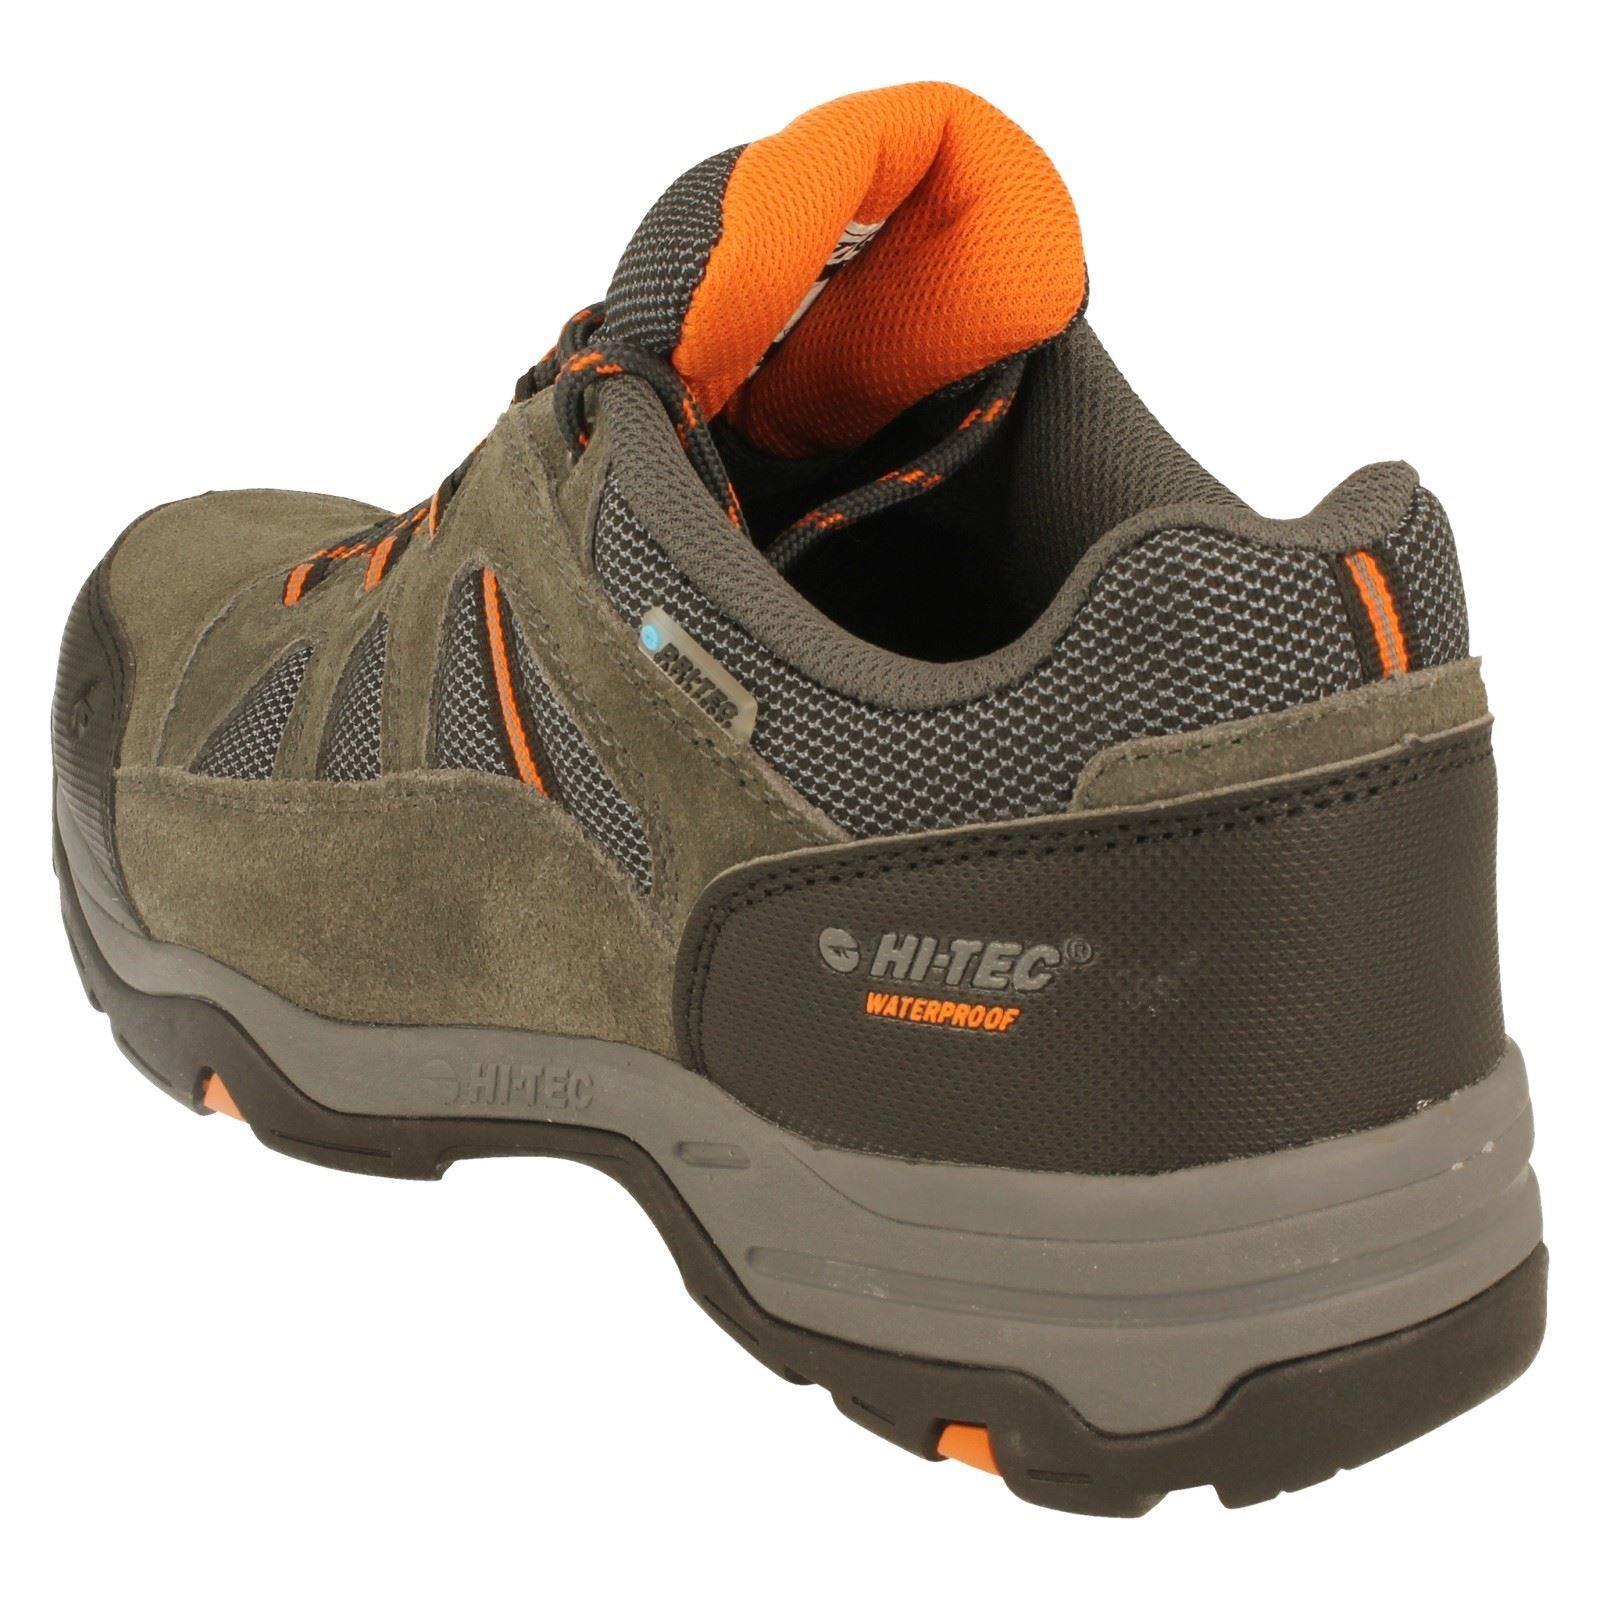 Mens Hi-Tec Walking Low Schuhes Style Bandera II Low Walking WP -W c7c29b